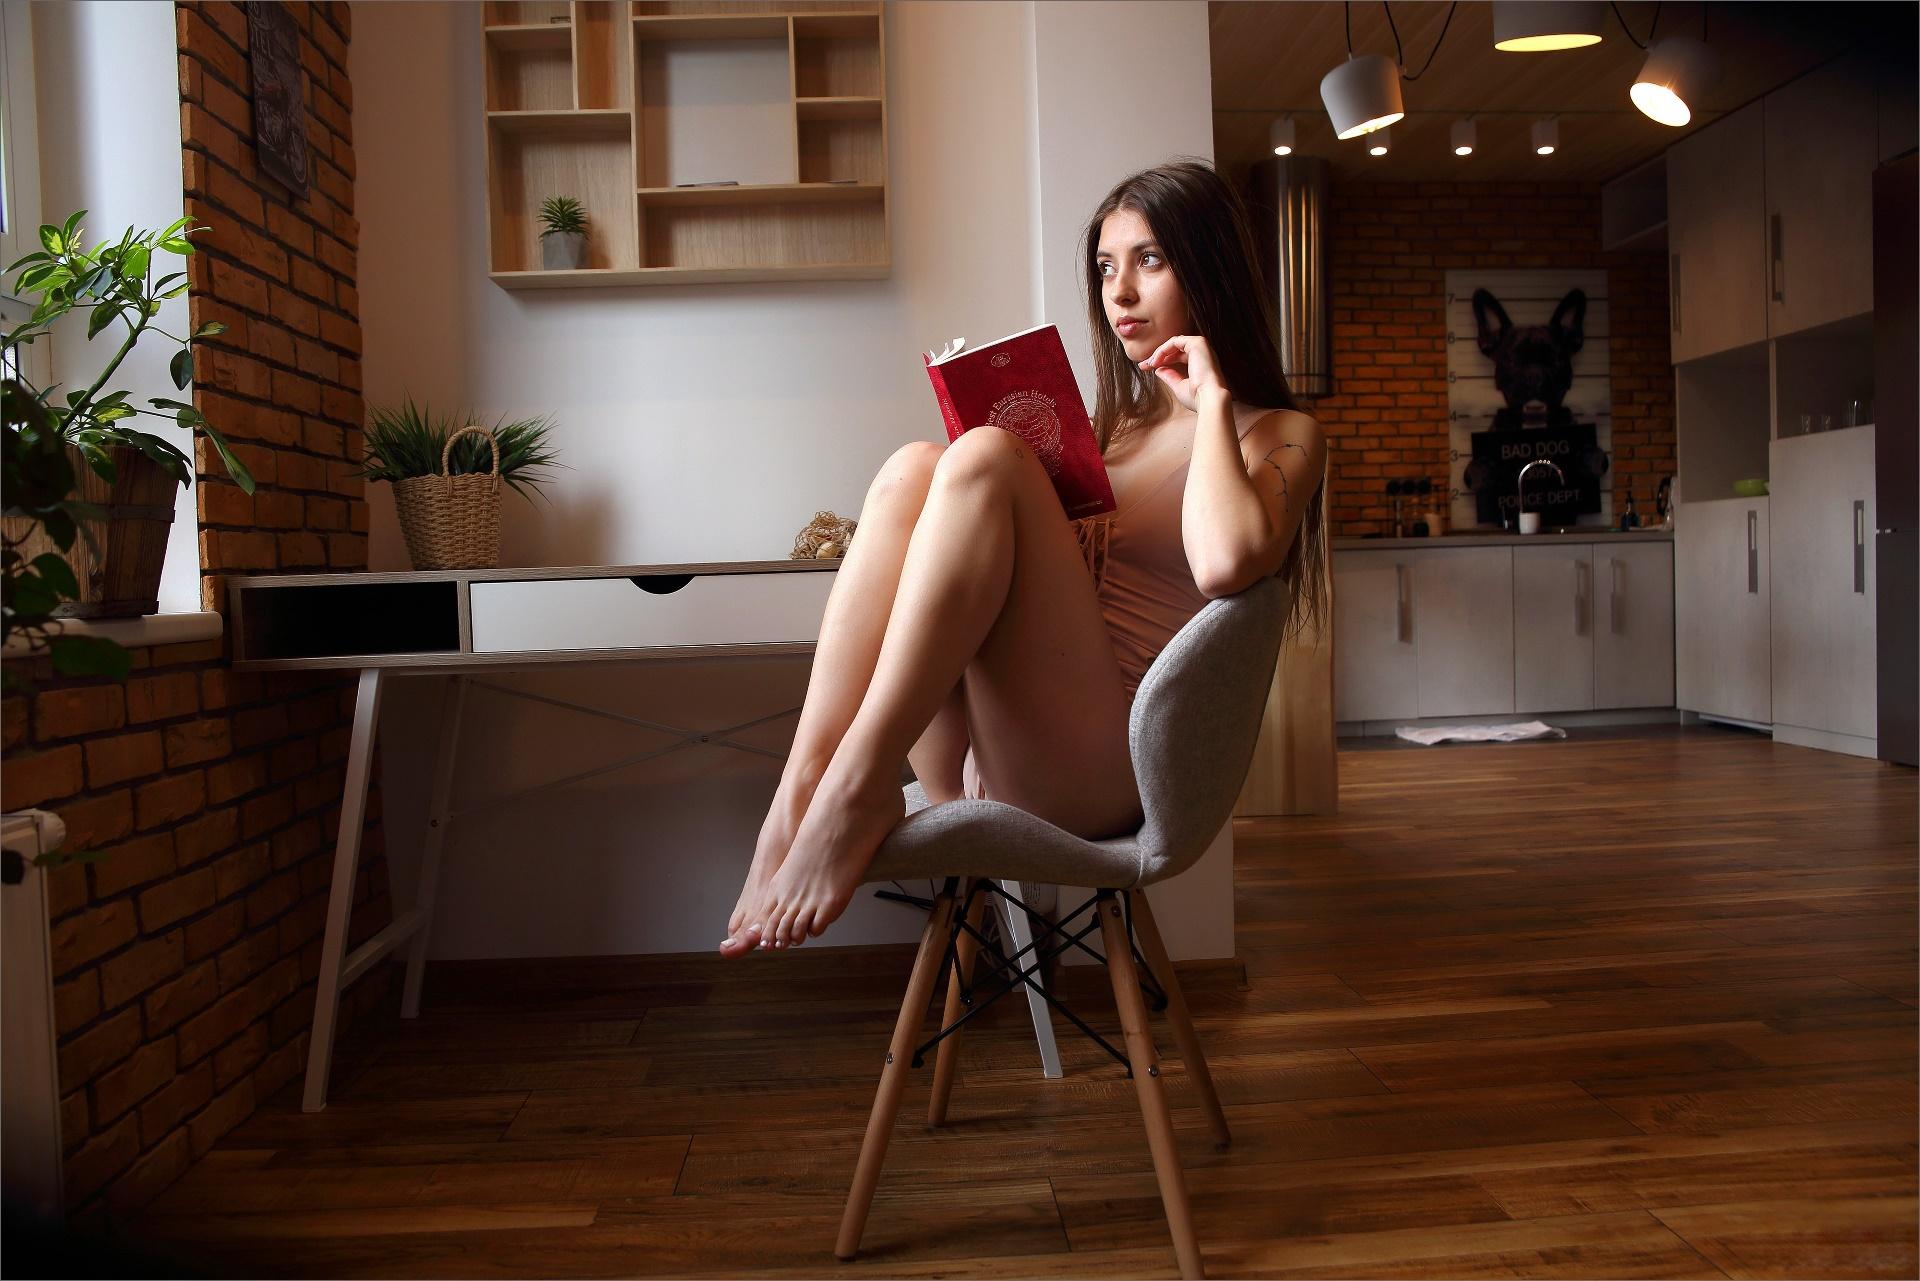 People 1920x1281 women barefoot books chair women indoors dark hair brunette reading